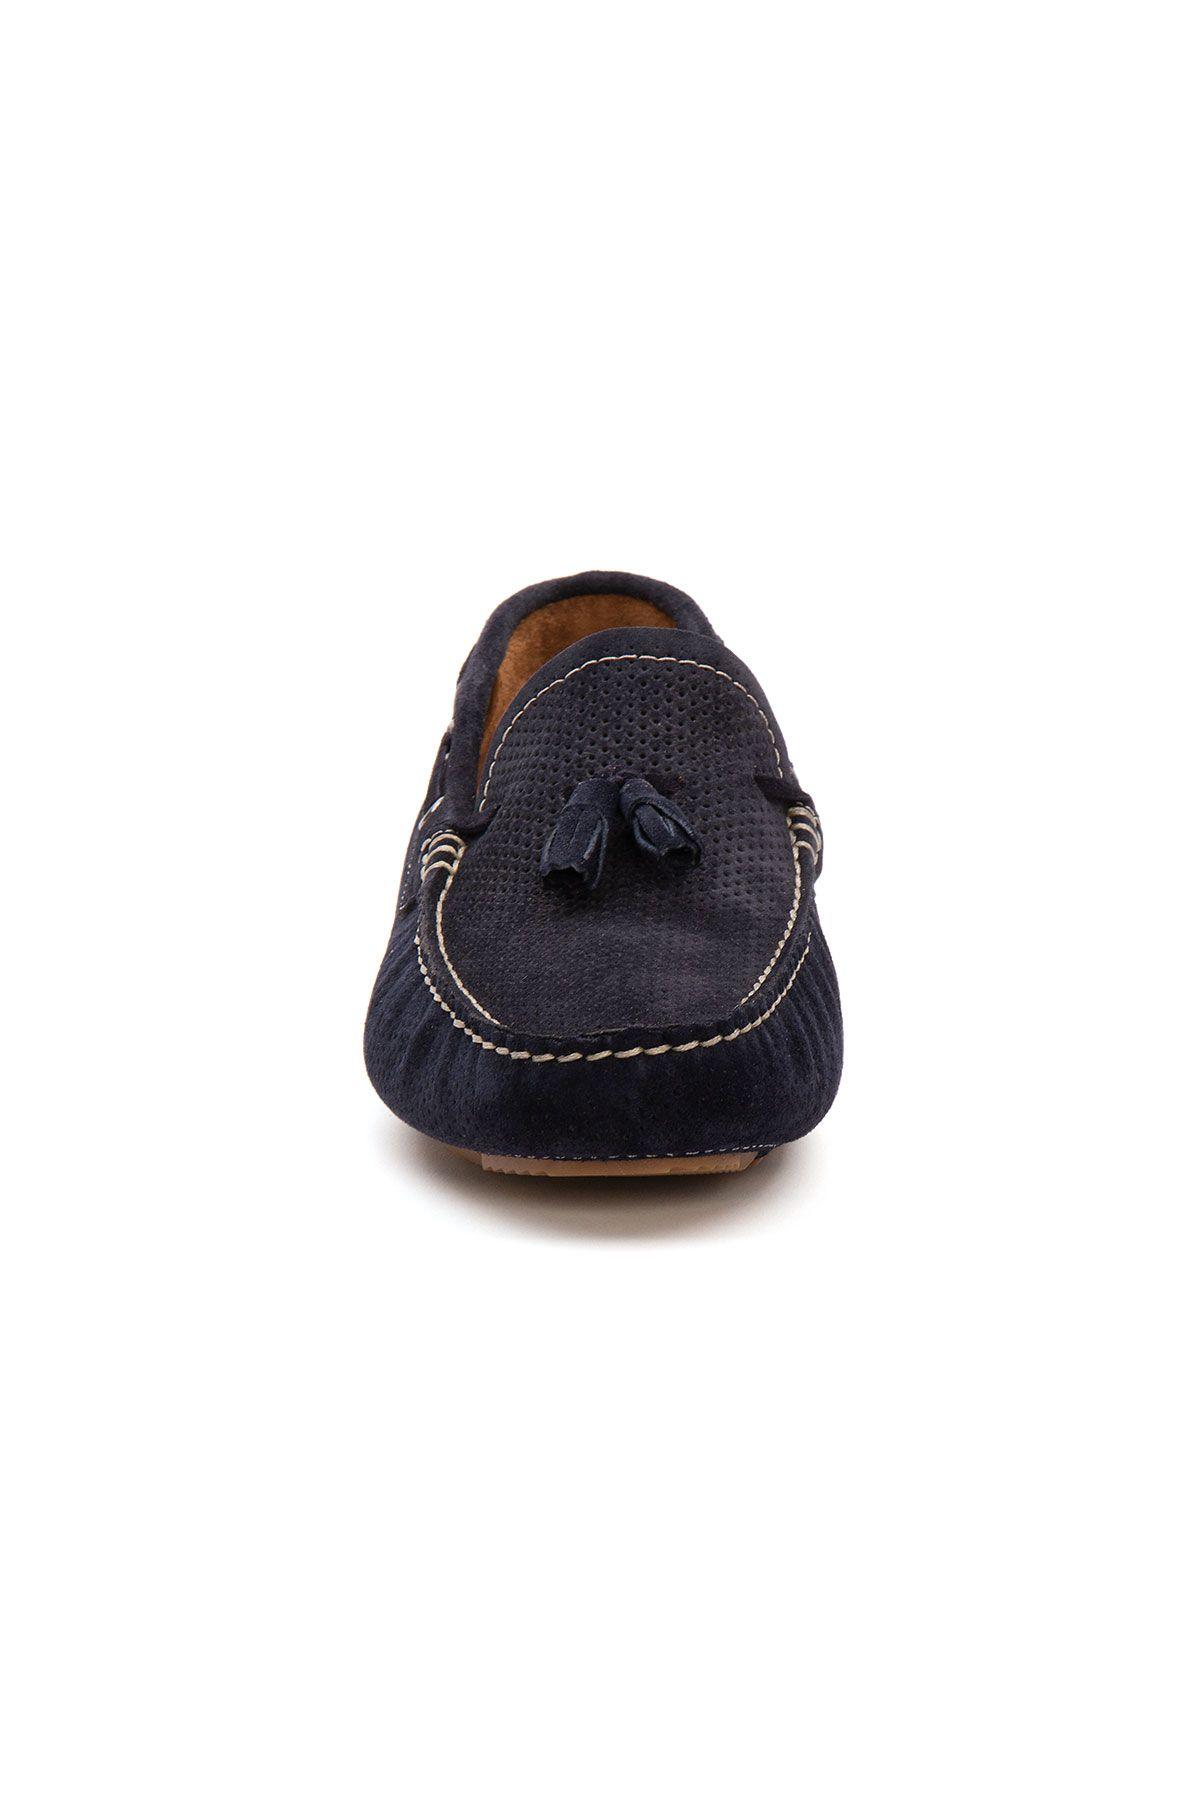 Pegia Genuine Suede Men's Tassel Loafer 500903 Navy blue